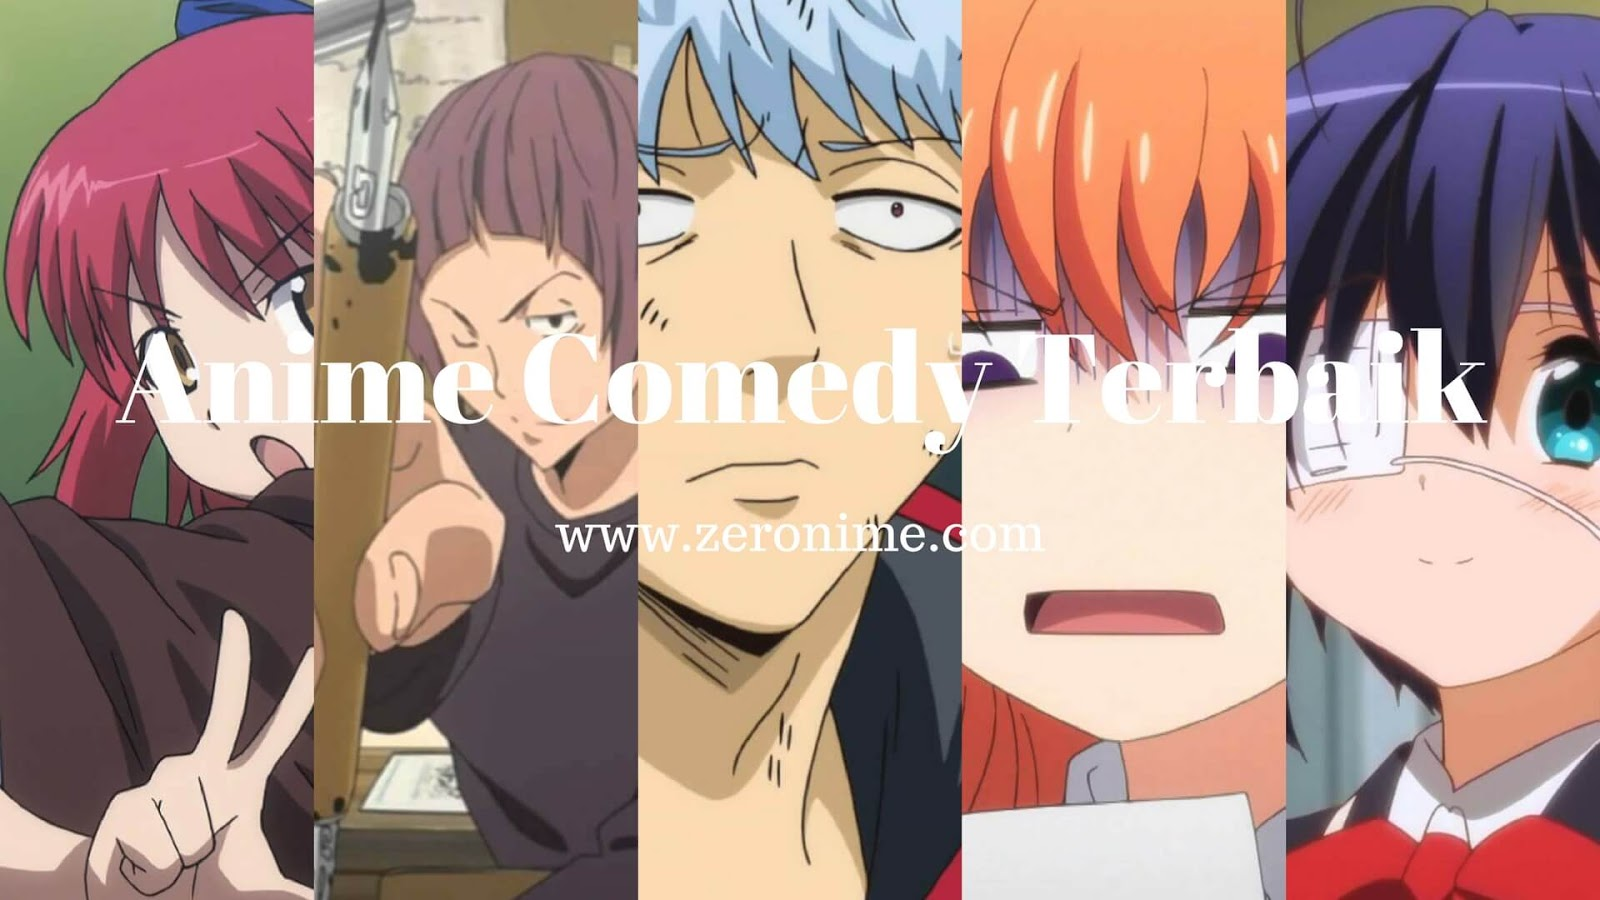 Anime Comedy Merupakan Salah Satu Genre Yang Banyak Disukai Sekali Kalangan Sebab Isi Ceritanya Ringan Dan Disertai Oleh Humor Lucu